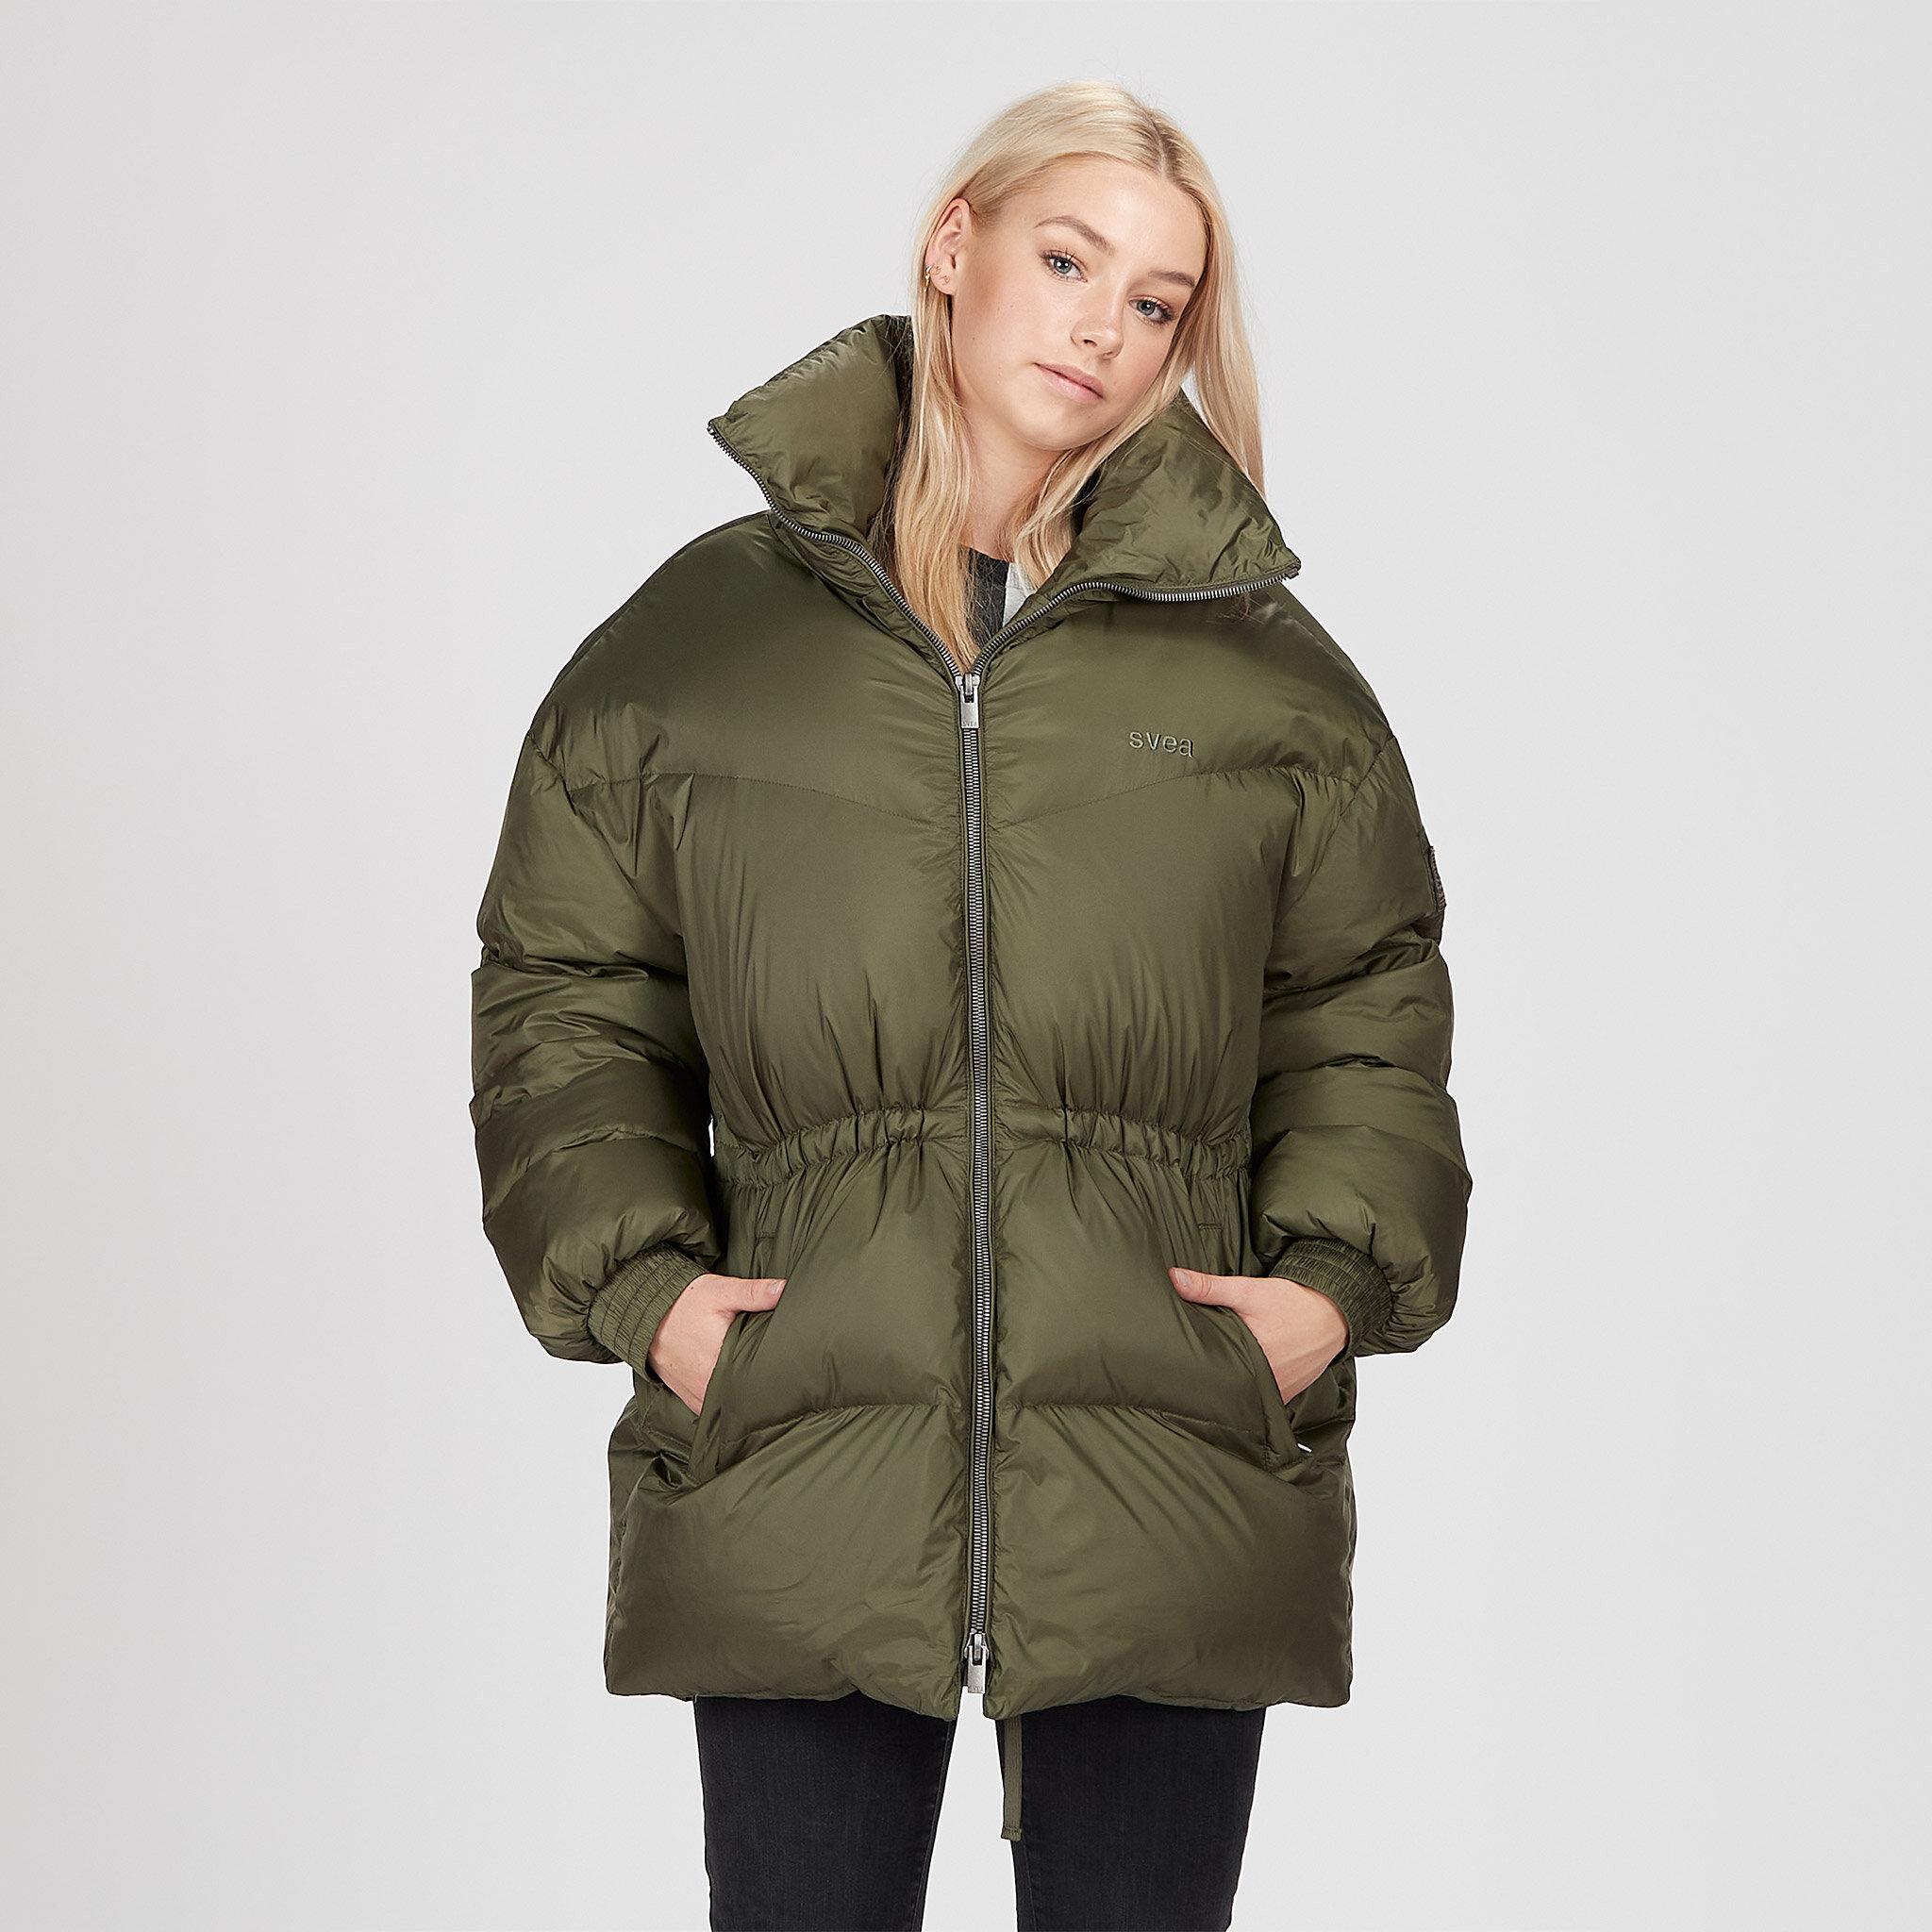 Generous Hip Length Jacket